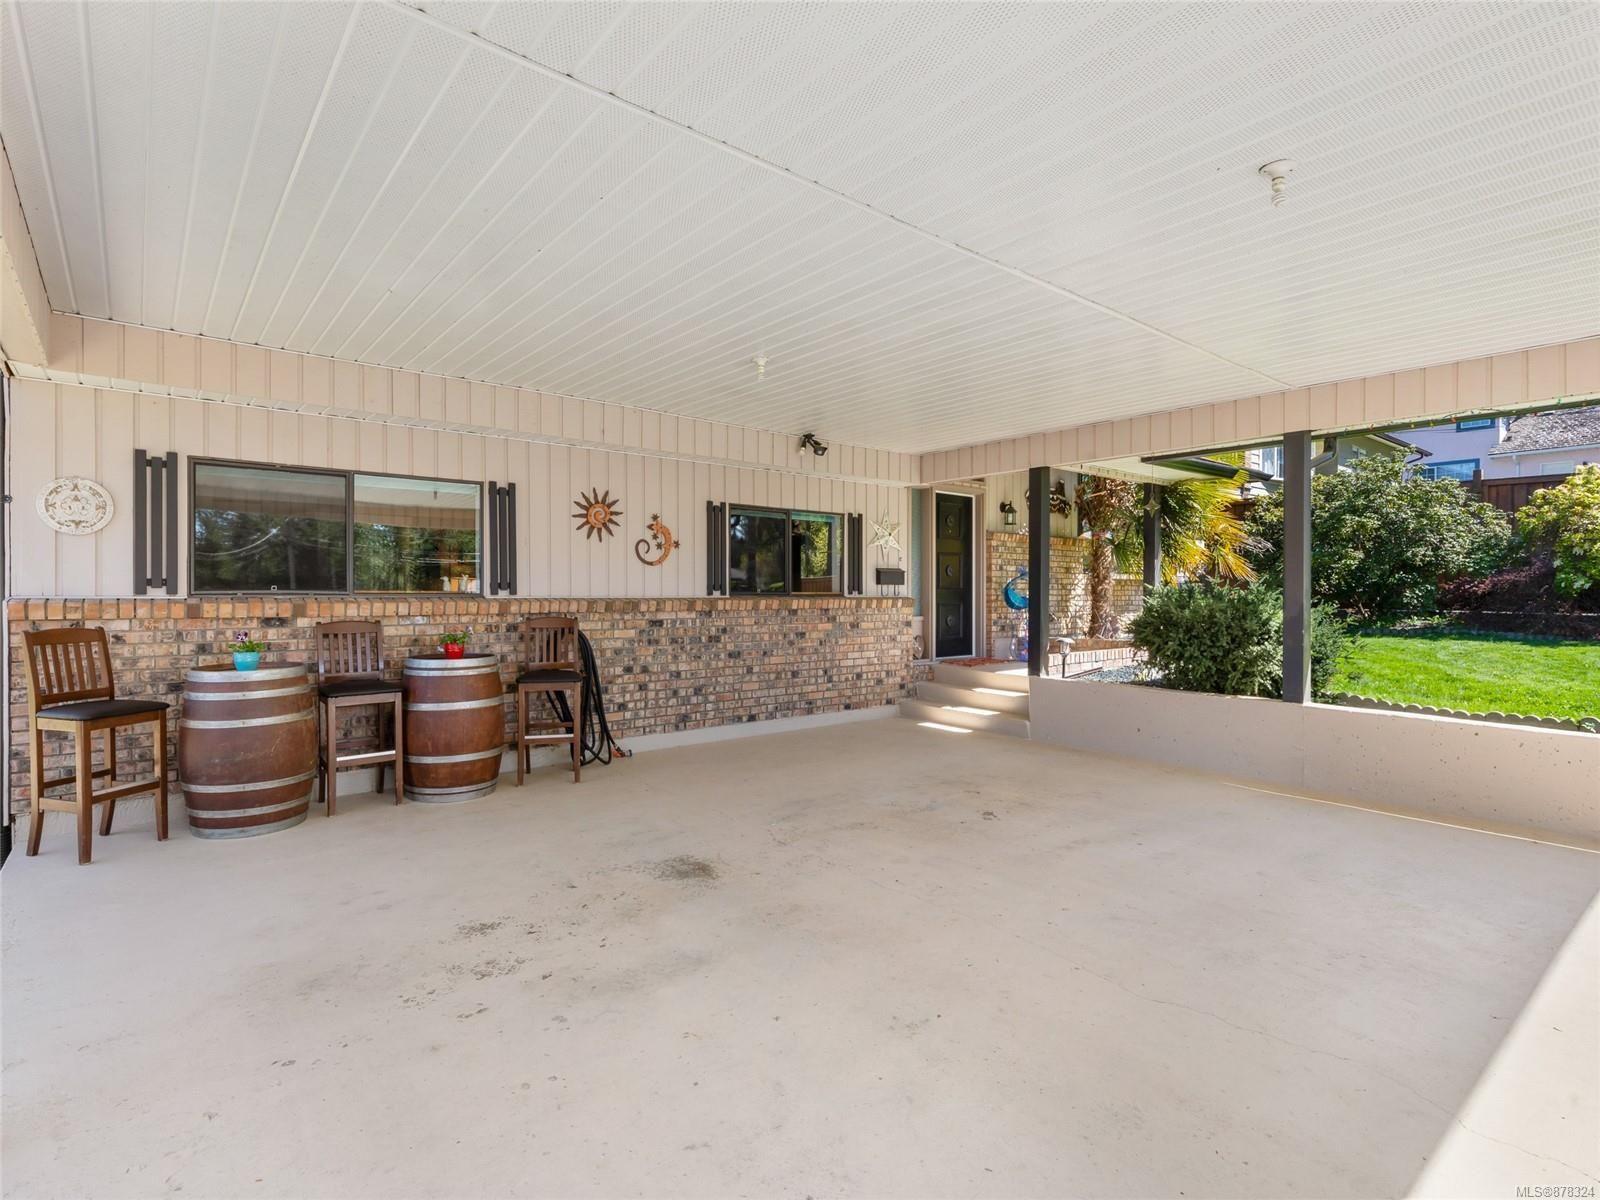 Photo 44: Photos: 3875 Moore Rd in : PA Port Alberni House for sale (Port Alberni)  : MLS®# 878324